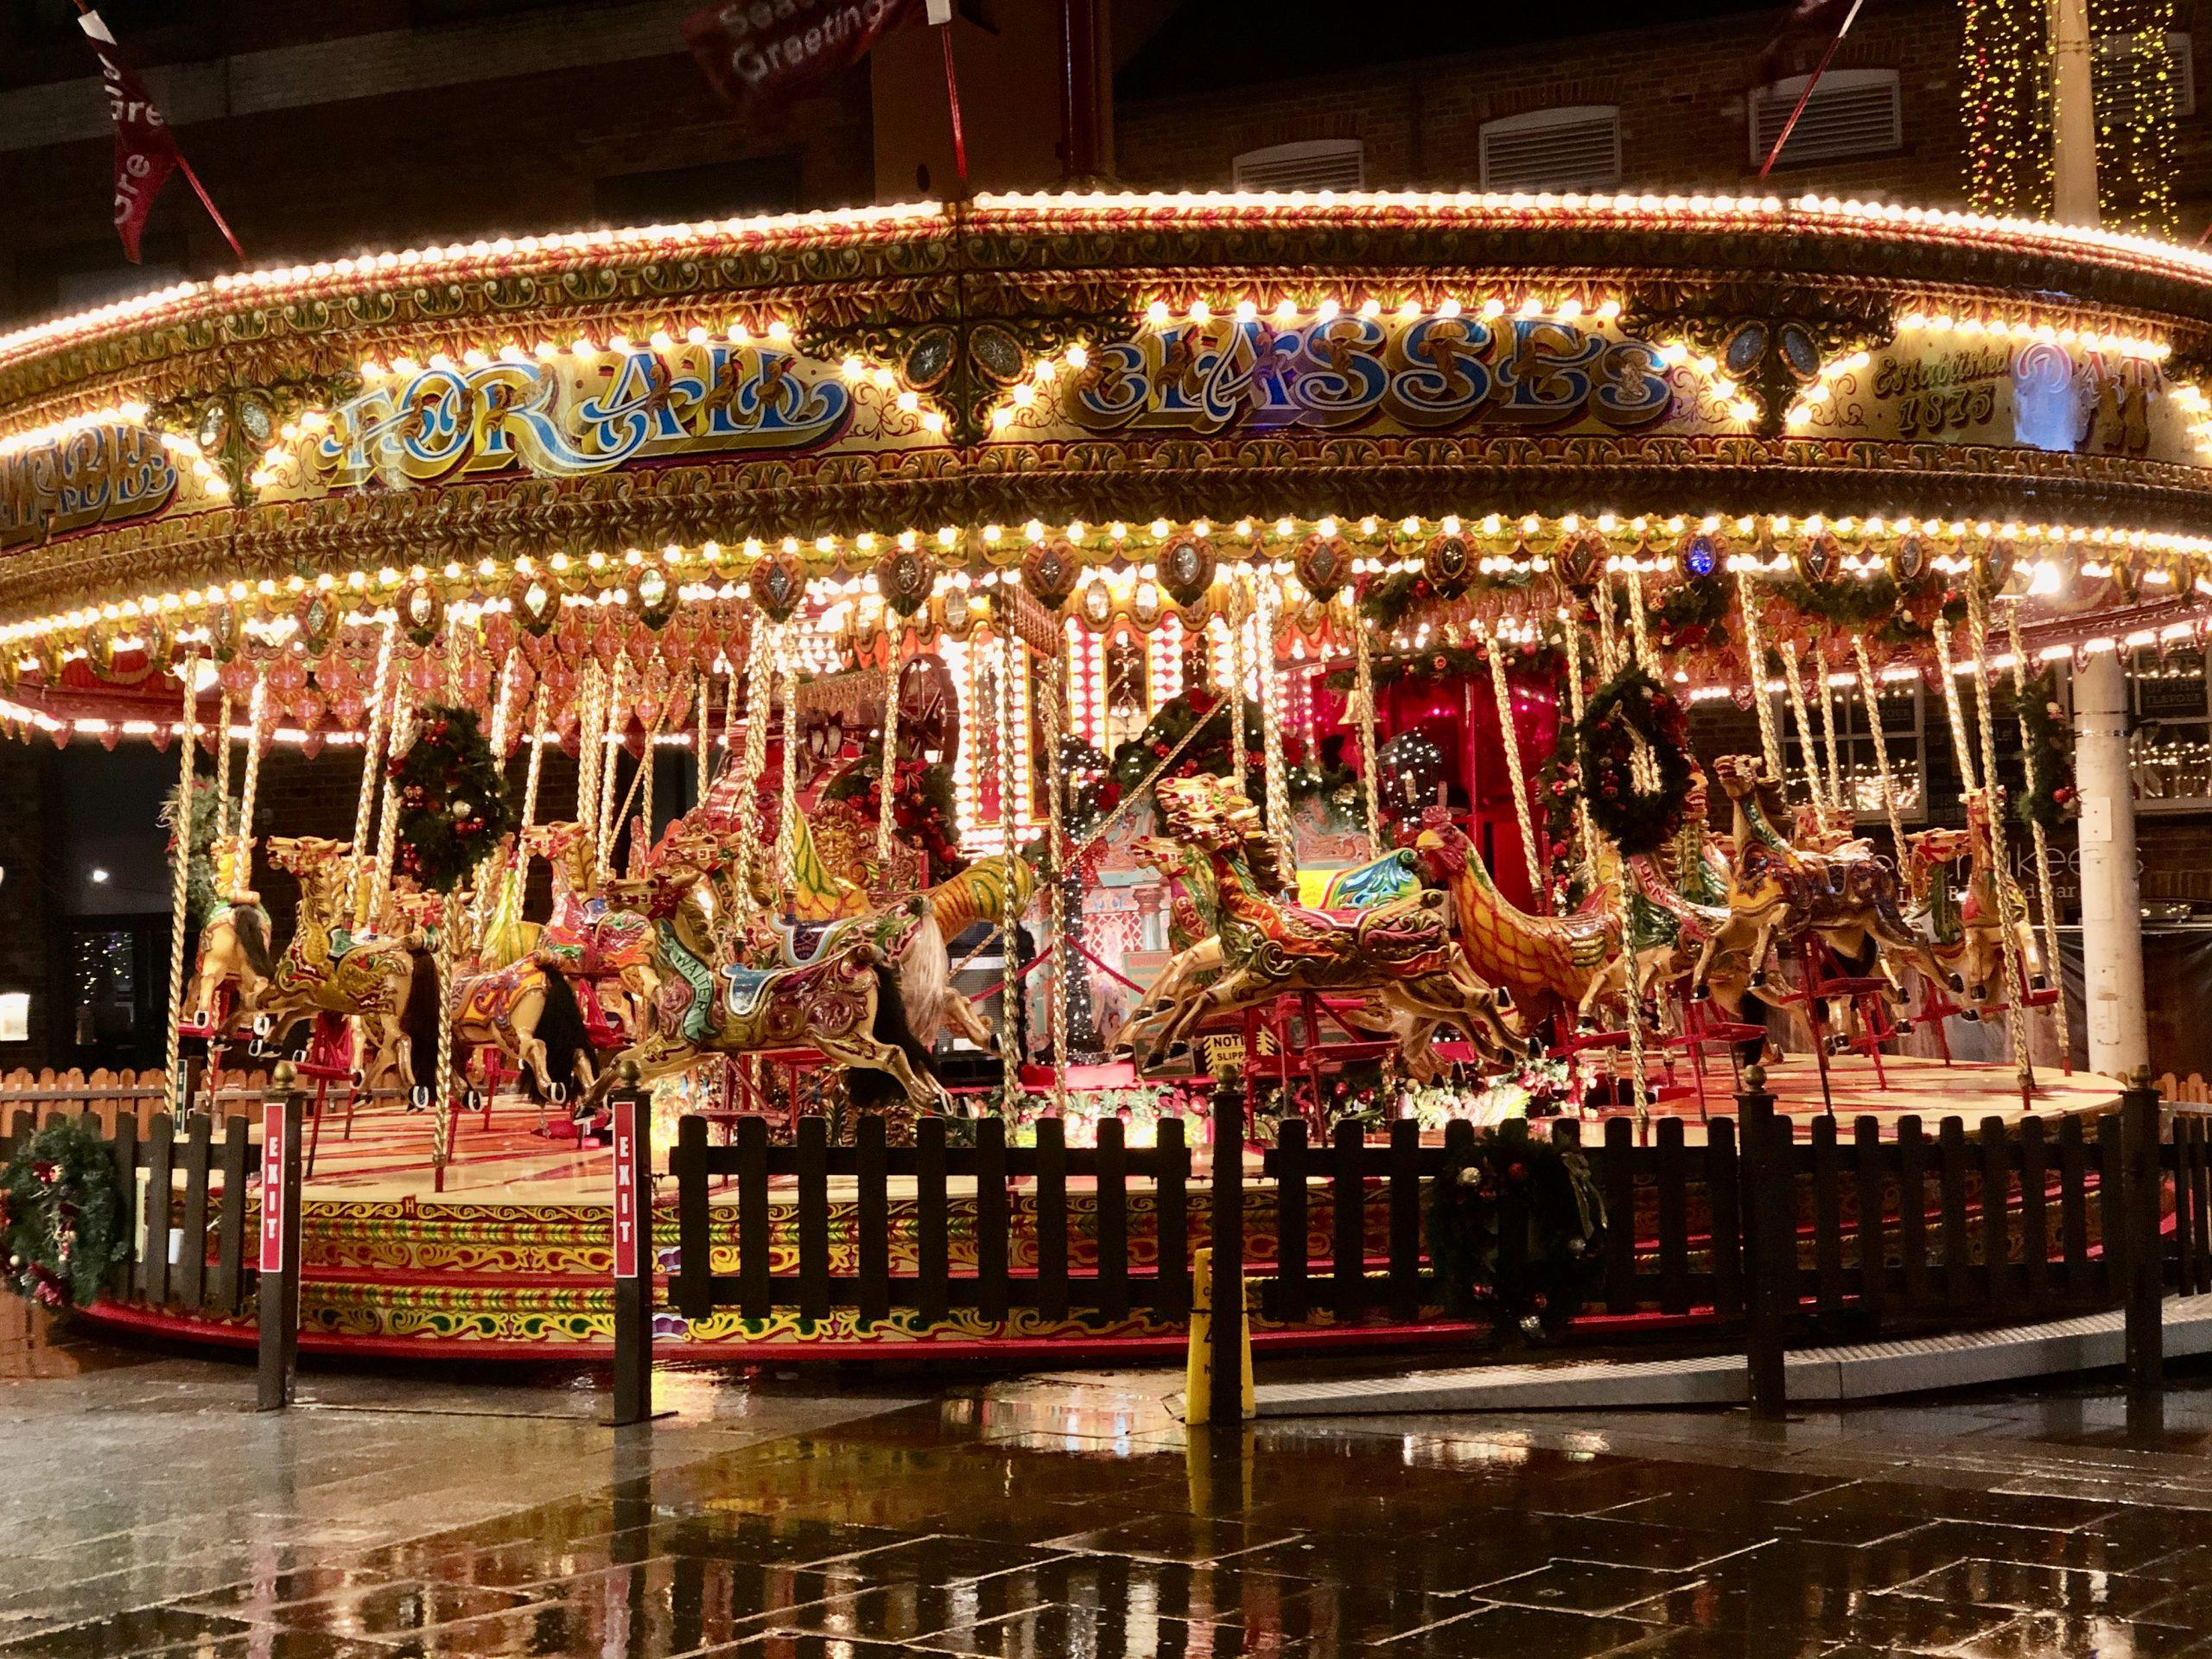 Decorative image of a carousel at Leeds Christmas Market